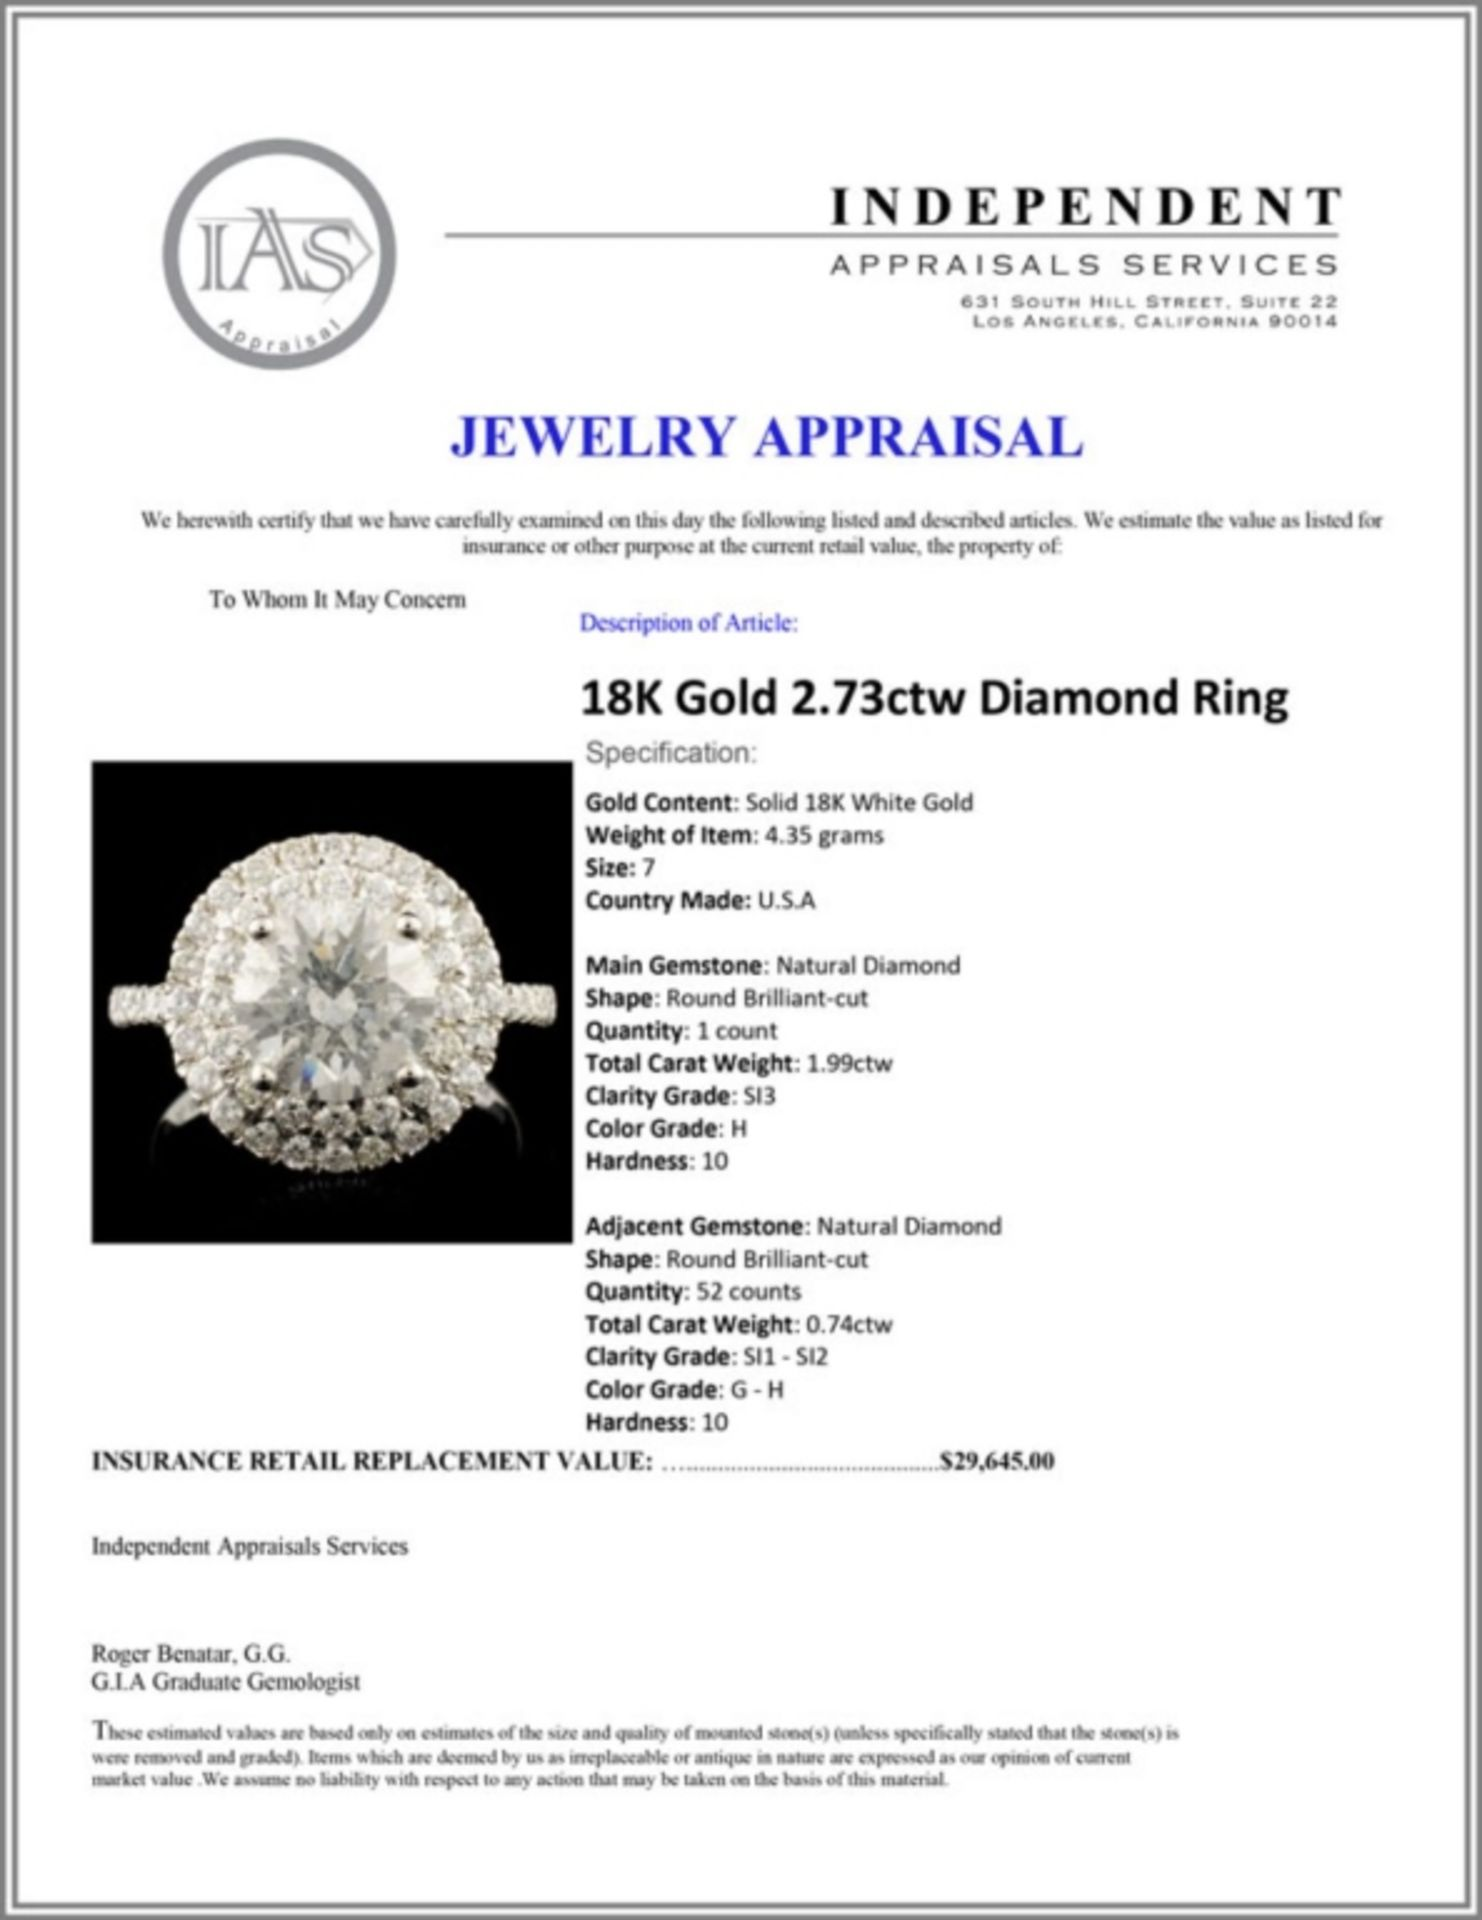 18K Gold 2.73ctw Diamond Ring - Image 7 of 7